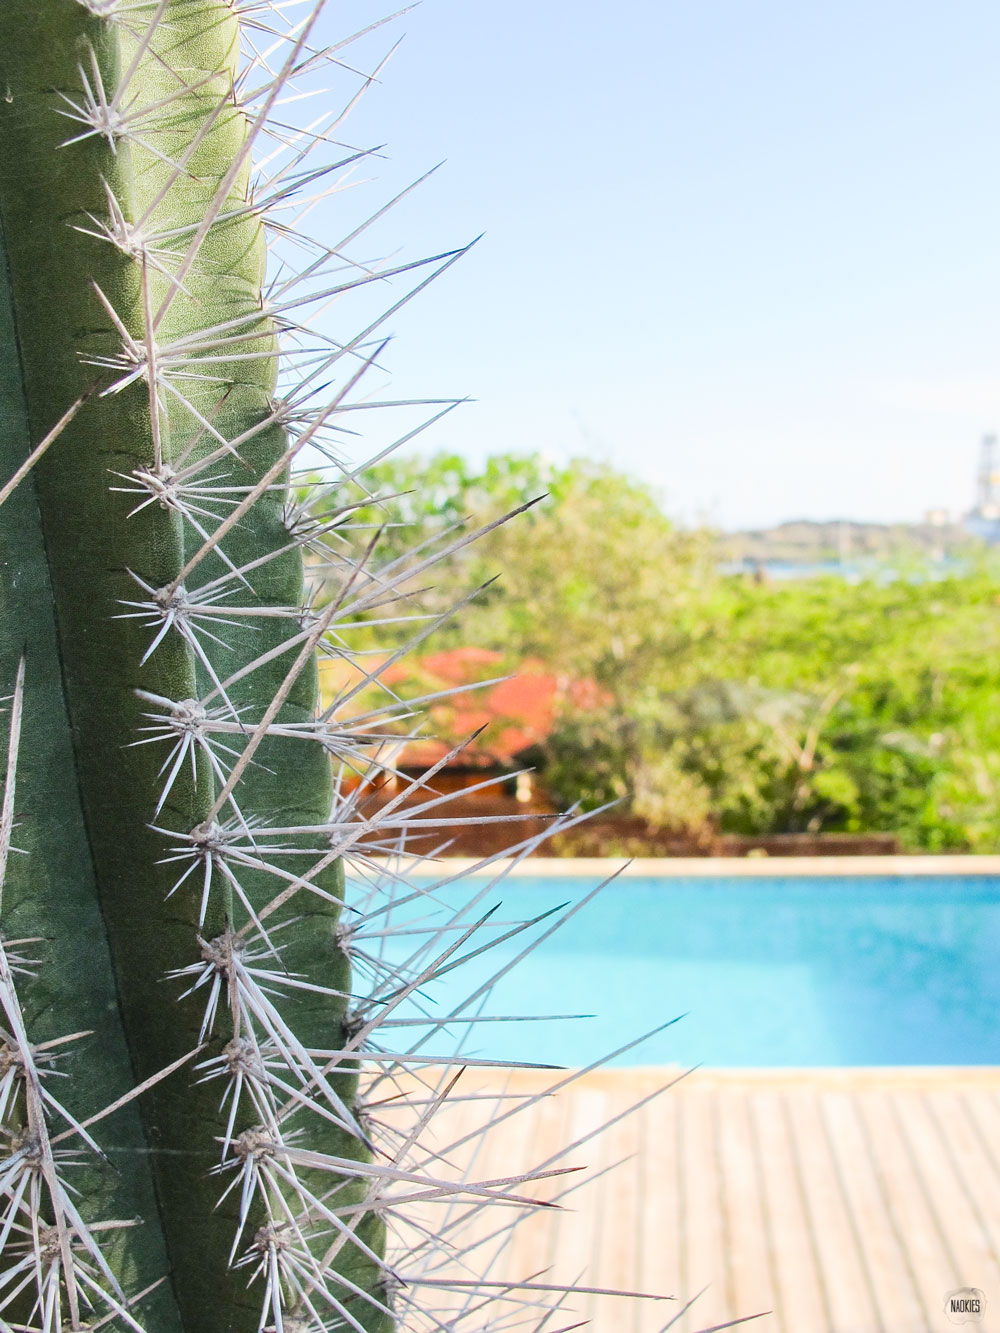 cactus ingezoomd zwembad ahtergron